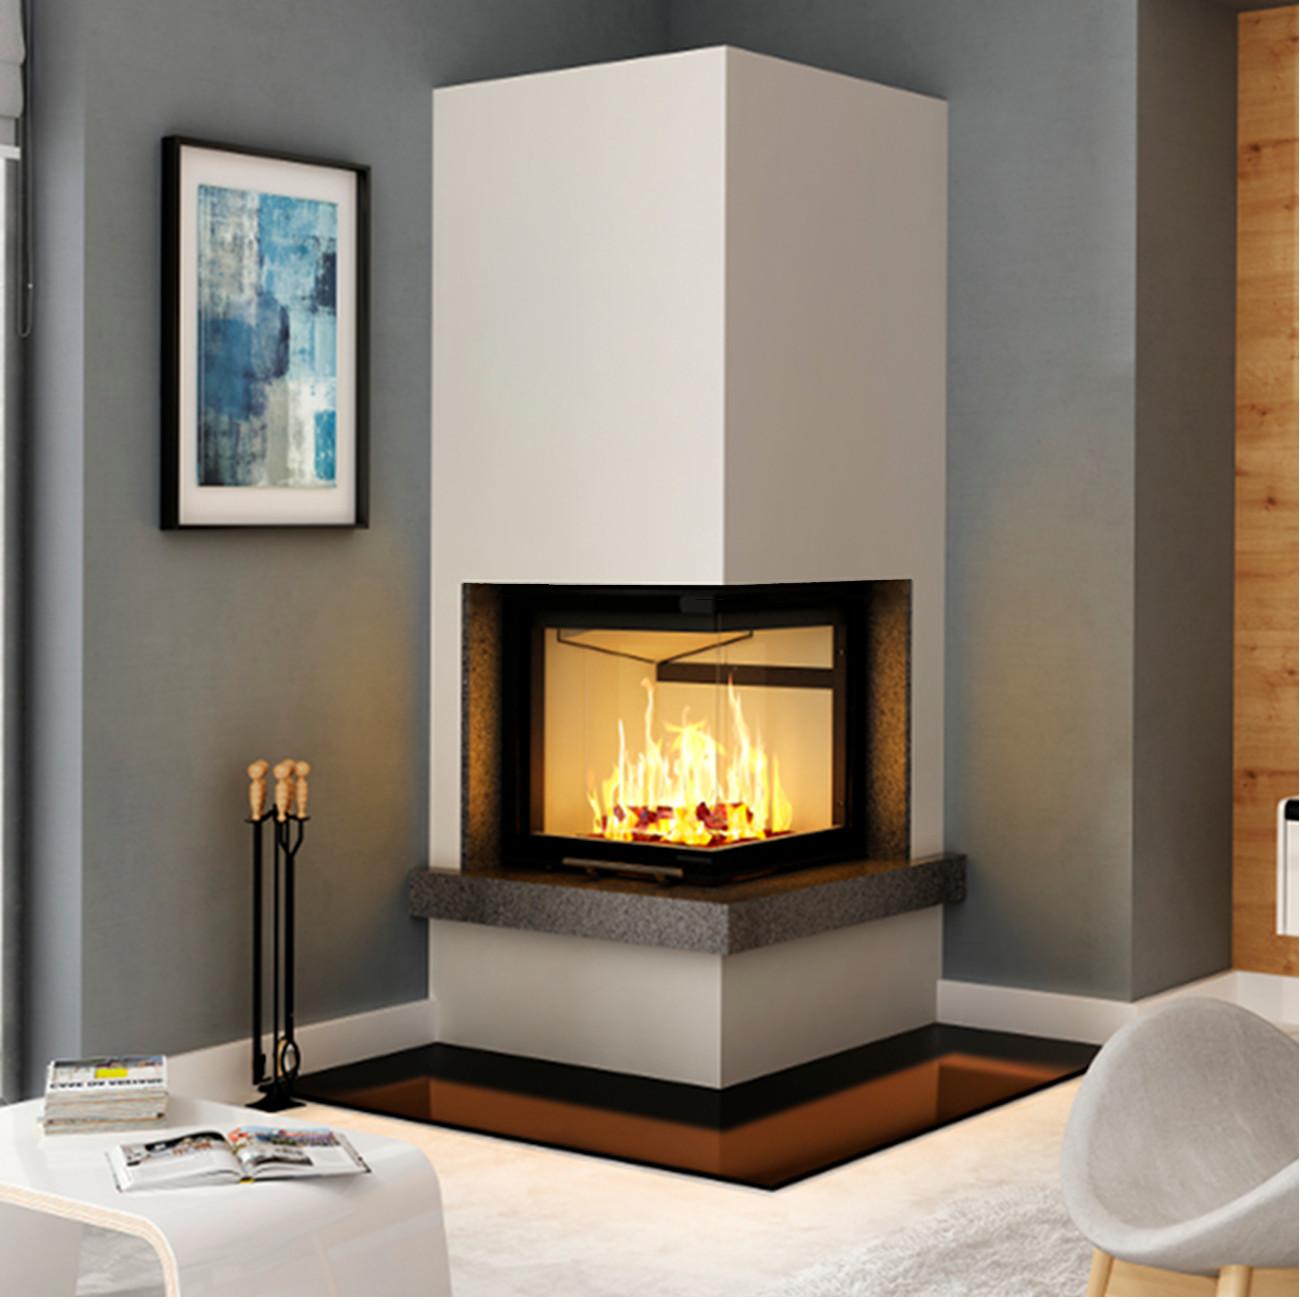 Fireplaces Etc Luxury Kaminbausatz Imperial Smart 2pth 7kw Eckkamin Rechts Hebetür